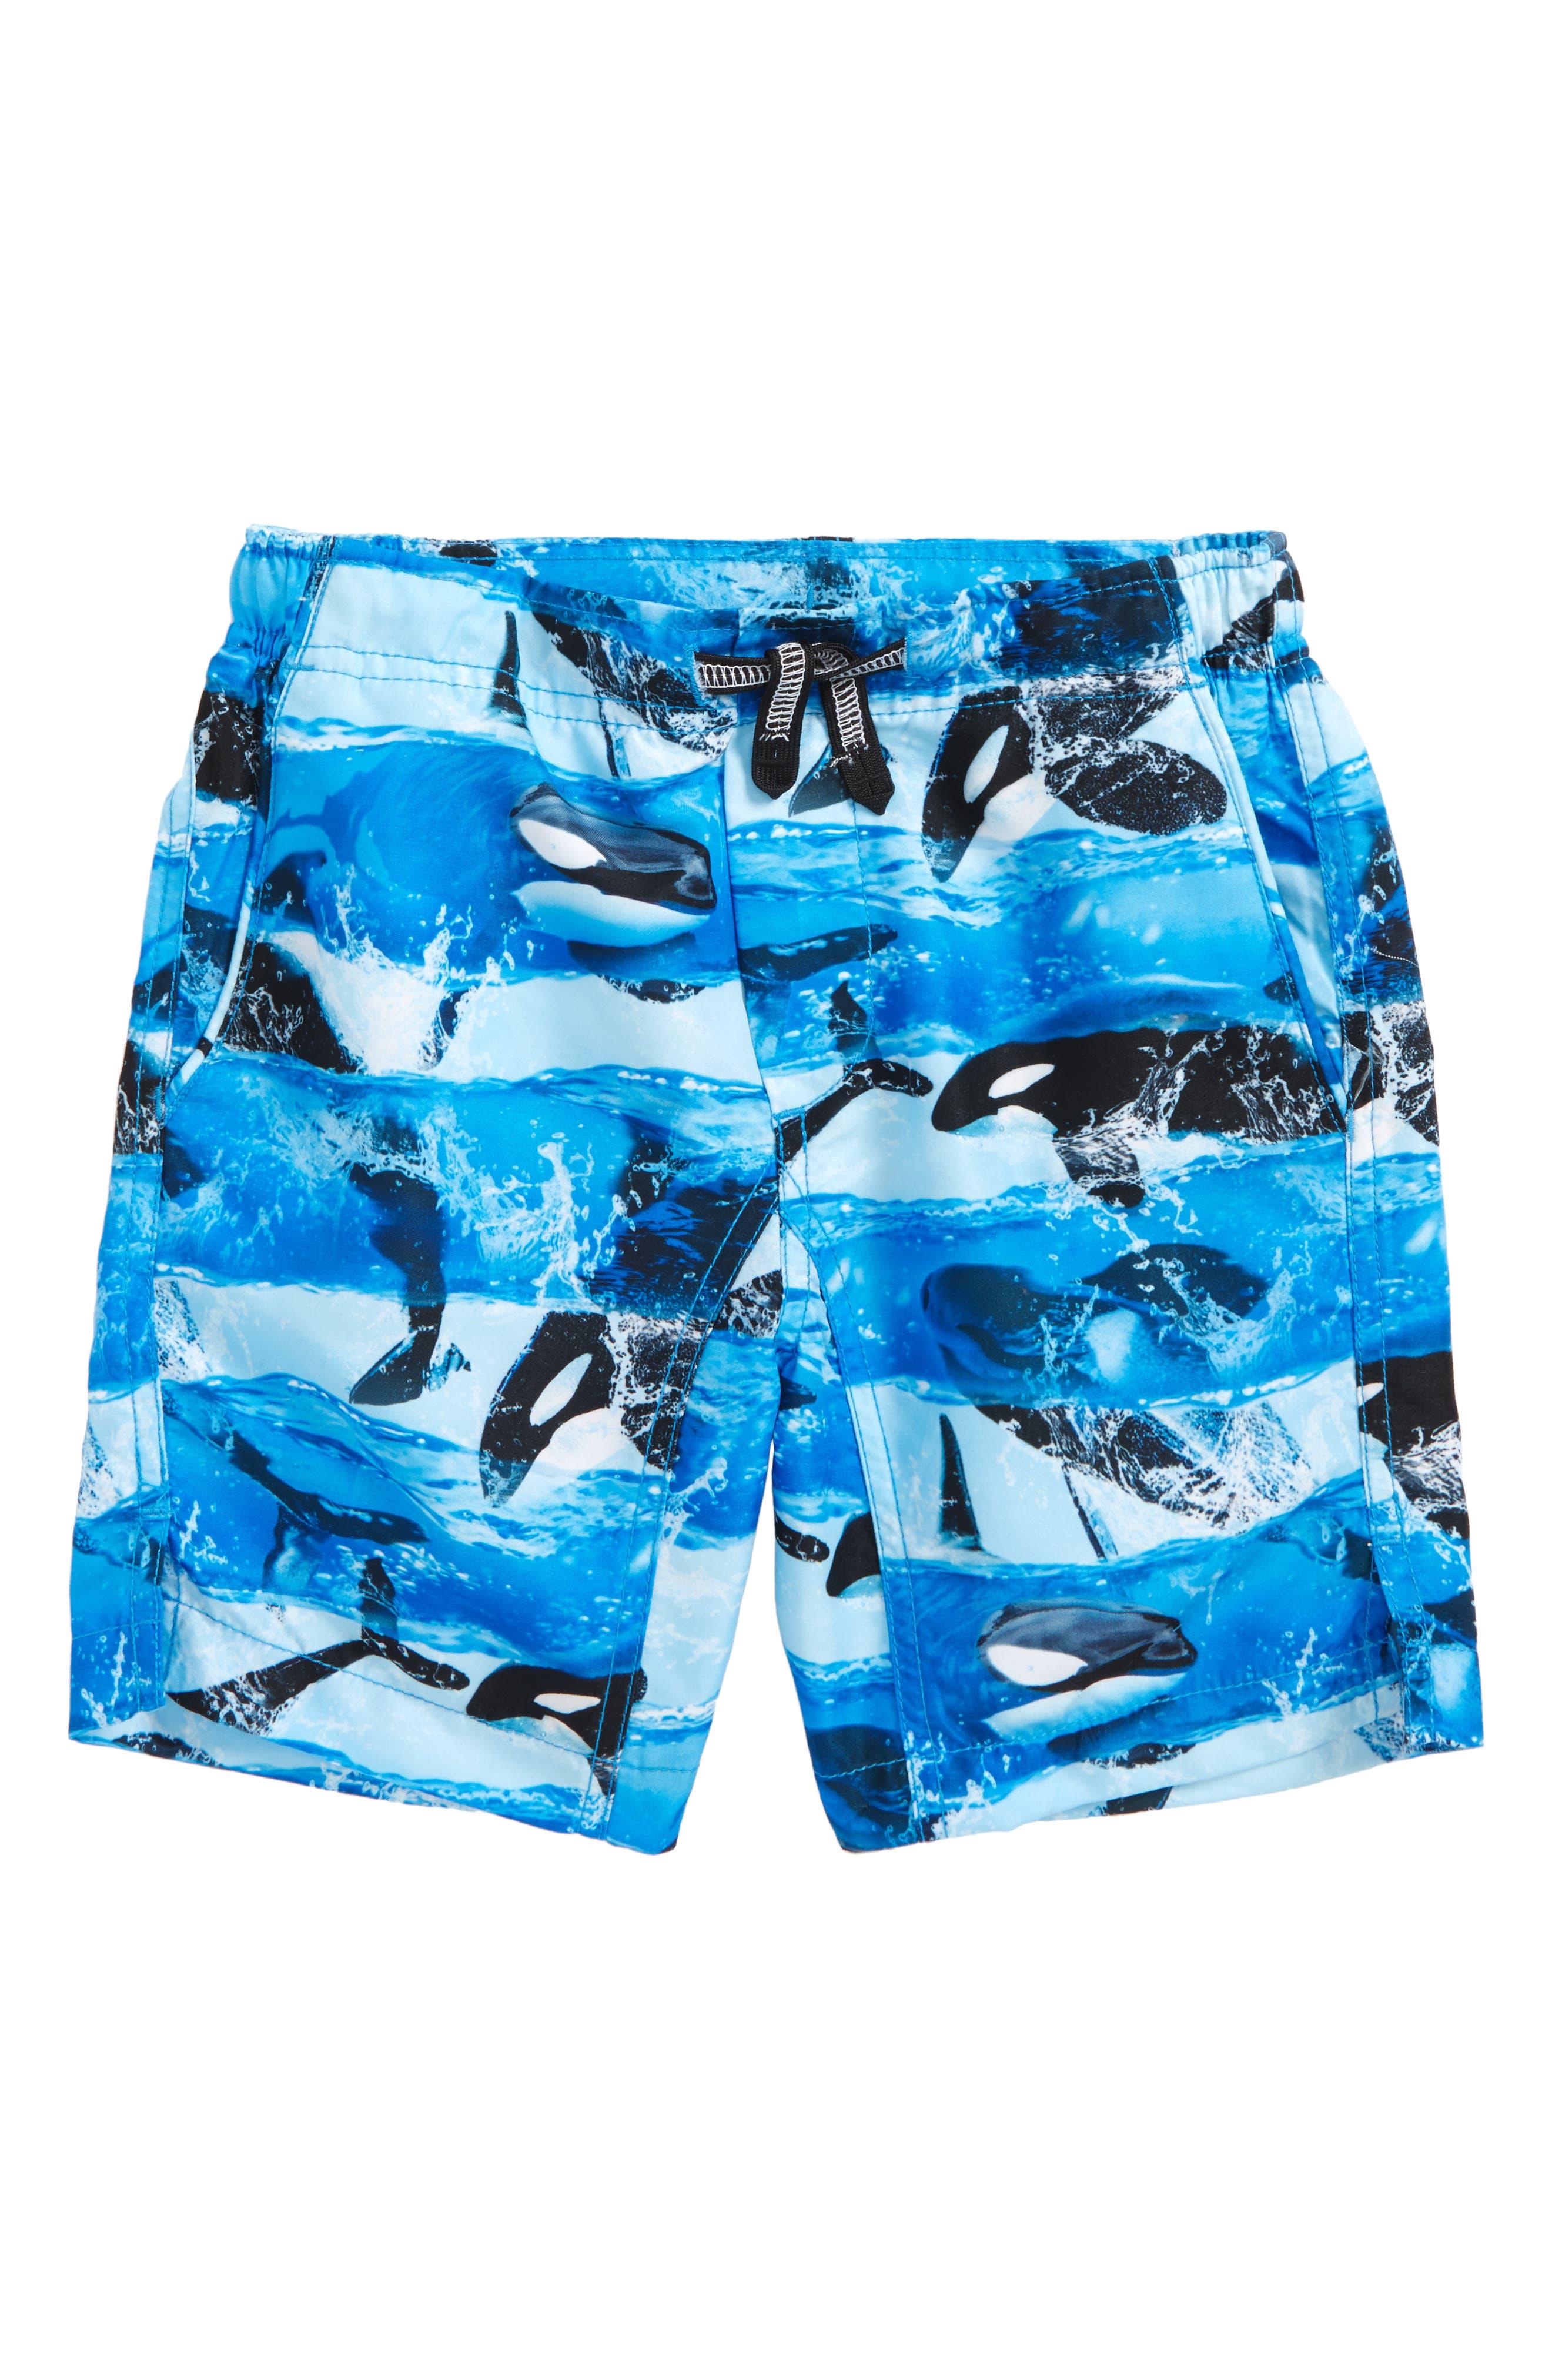 Nario Swim Trunks,                             Main thumbnail 1, color,                             Killer Whale